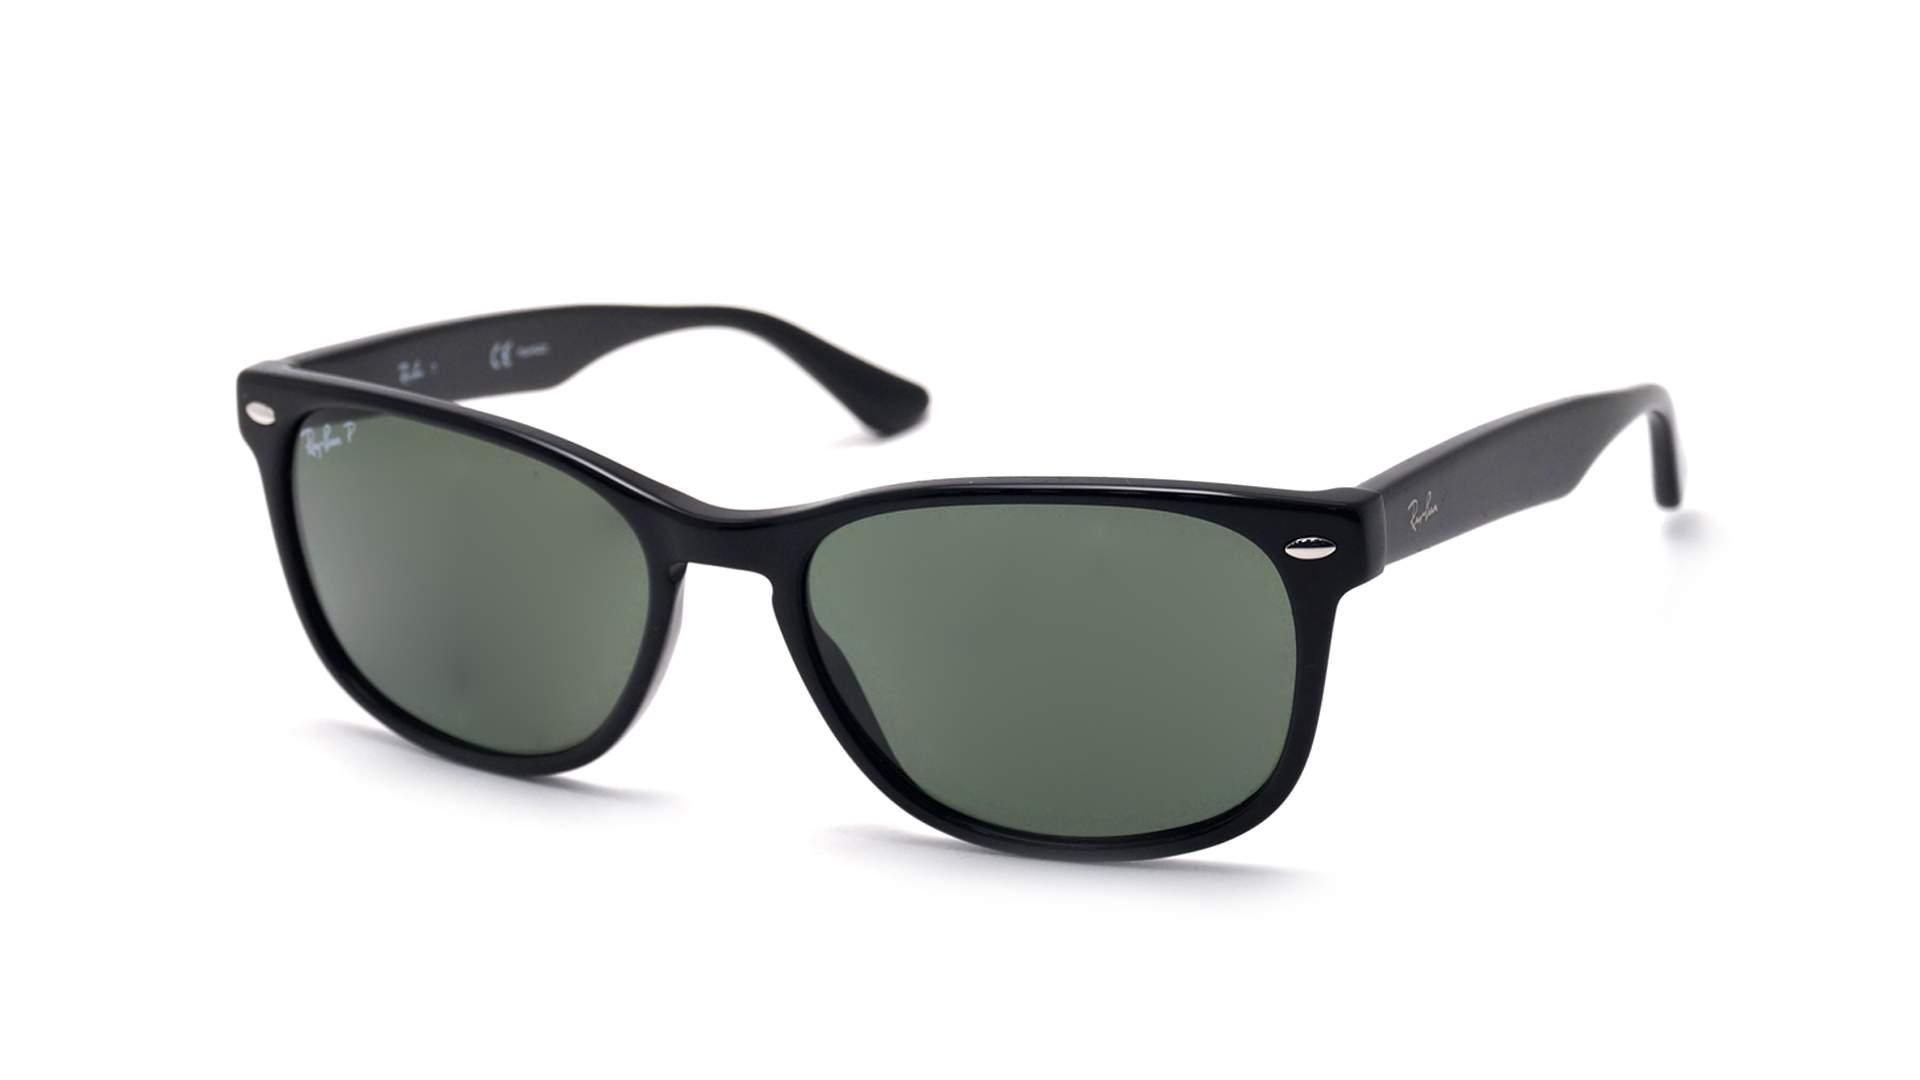 dc78499aac Sunglasses Ray-Ban RB2184 901 58 57-18 Black Large Polarized